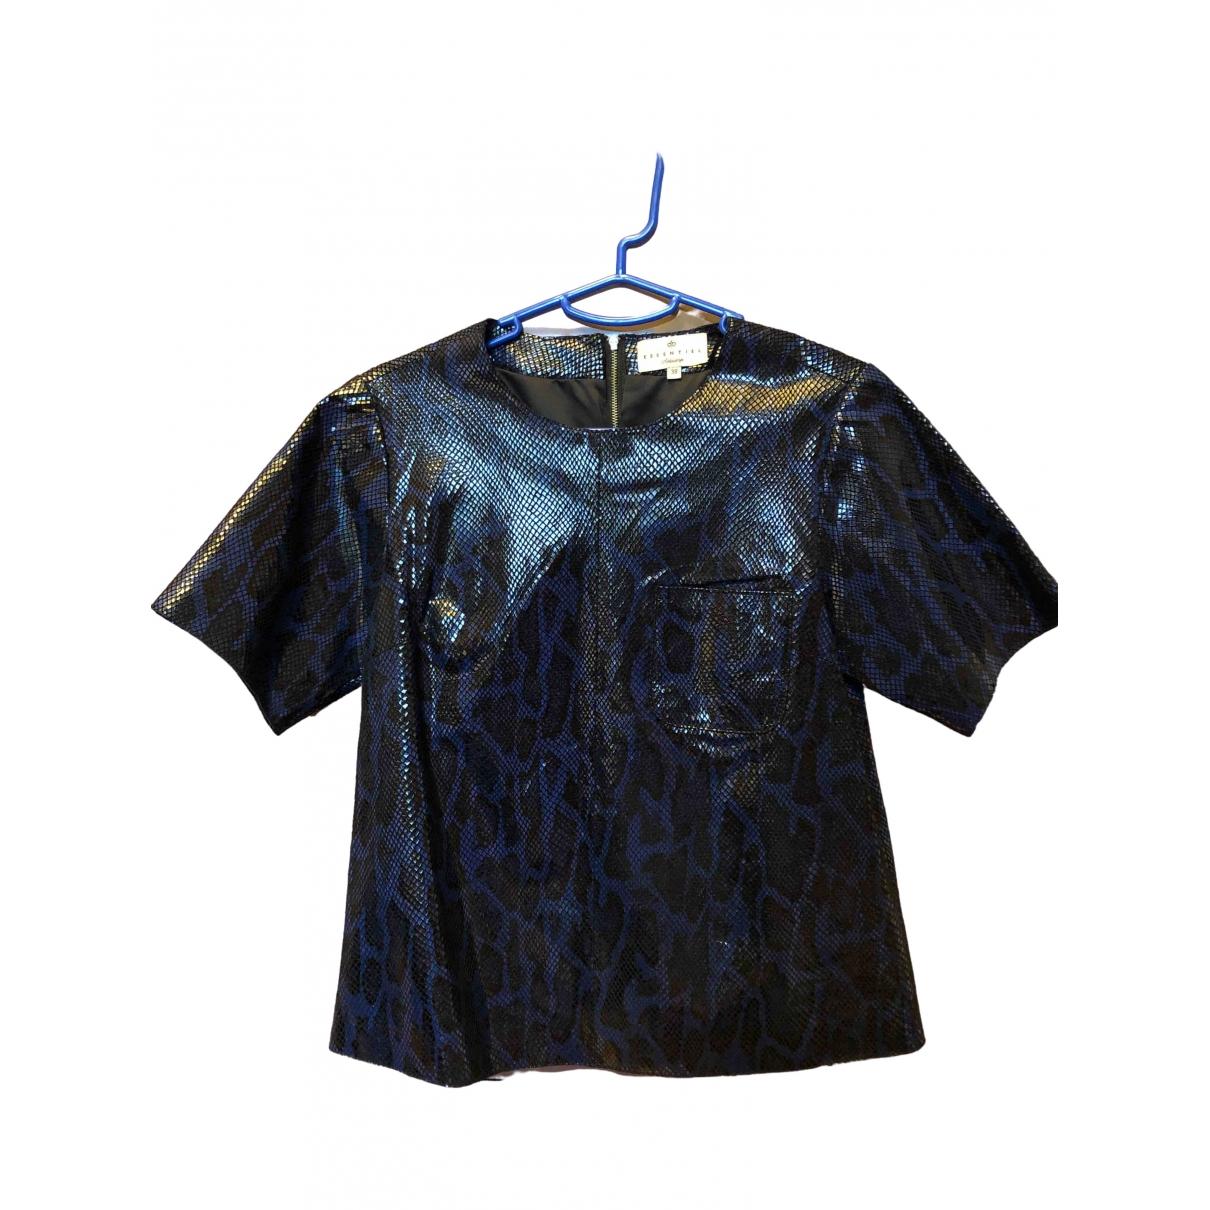 Essentiel Antwerp - Top   pour femme en cuir - bleu